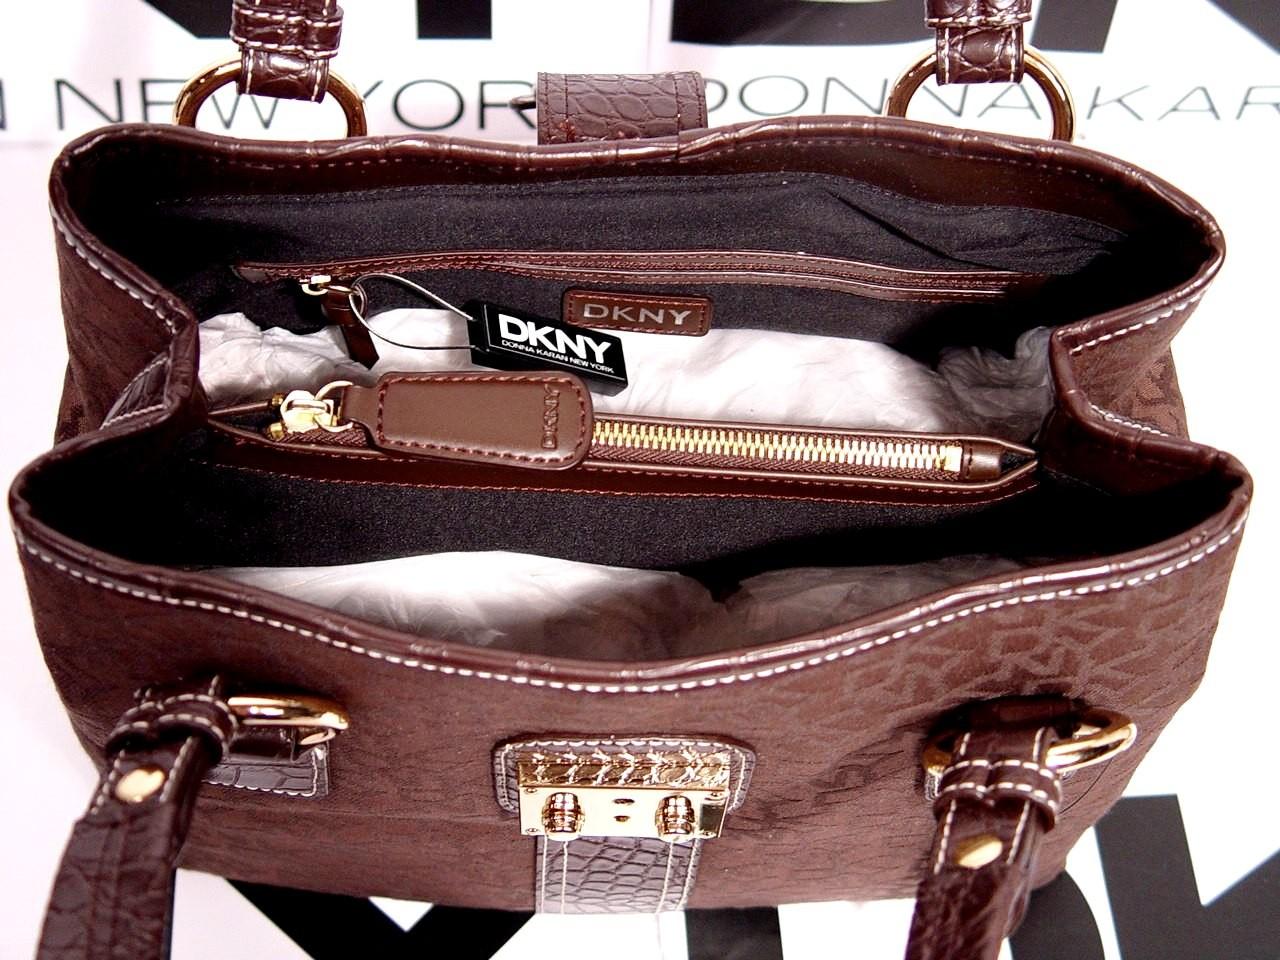 DKNY Signature Brown Medium Satchel Handbag ~ RM750